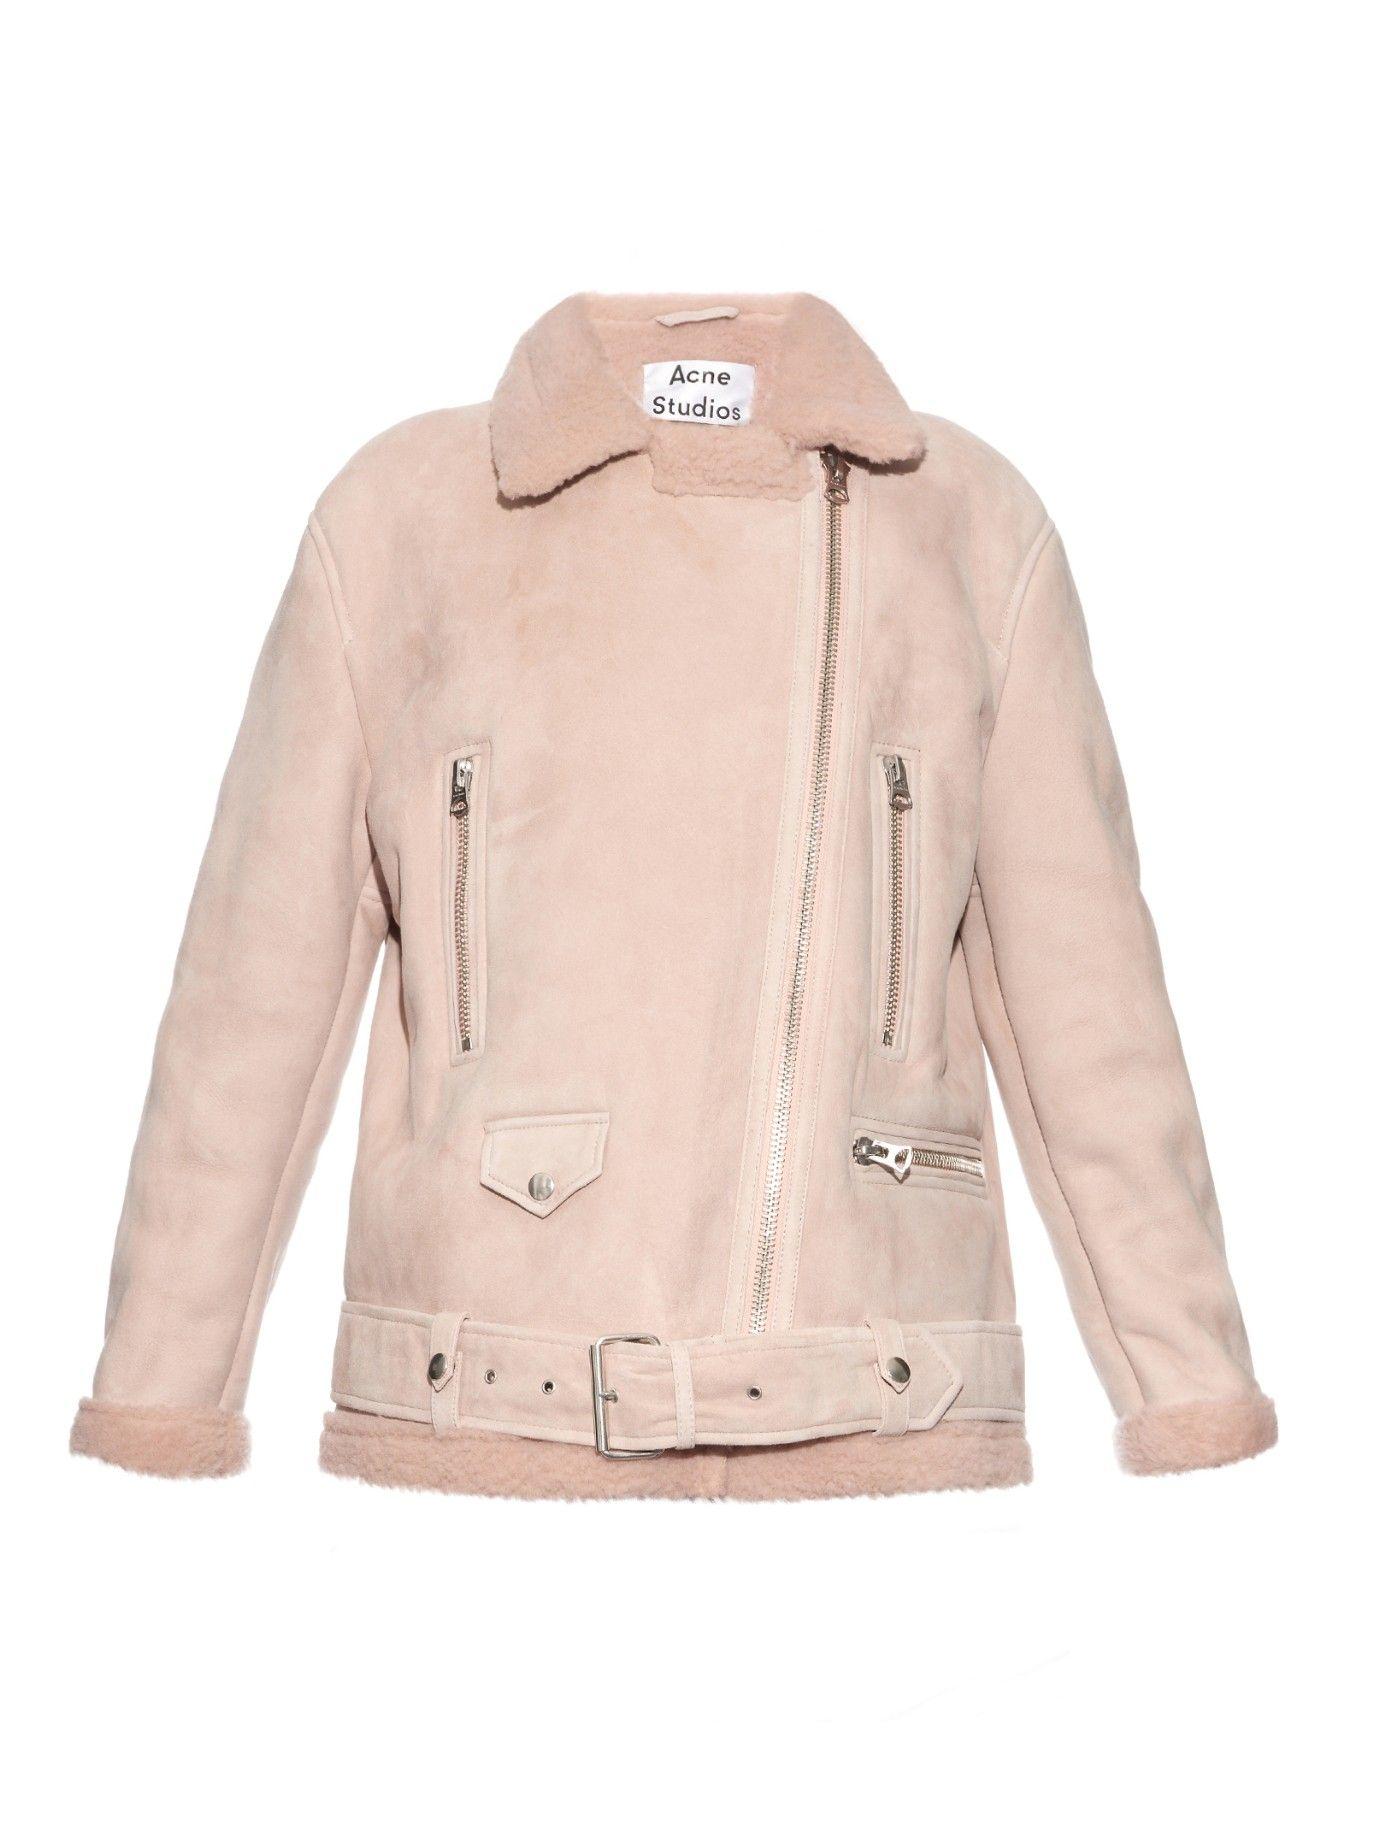 74015fdff895 Aviator Jackets, Pink Jacket, Long Jackets, Acne Studios, Parka, Aviation,